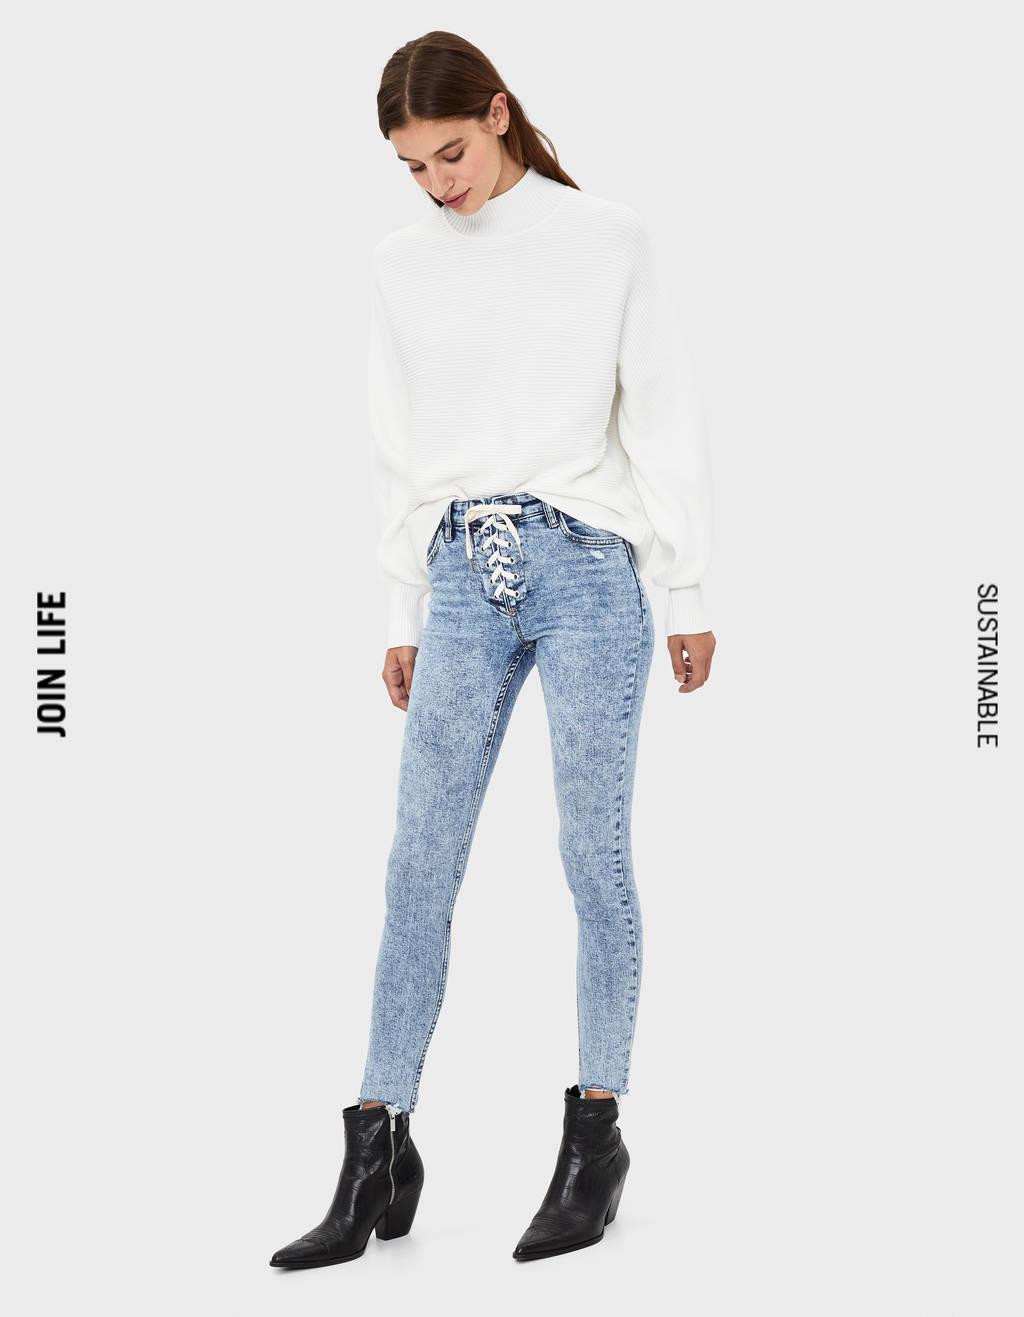 Jeans Skinny Fit com laçada